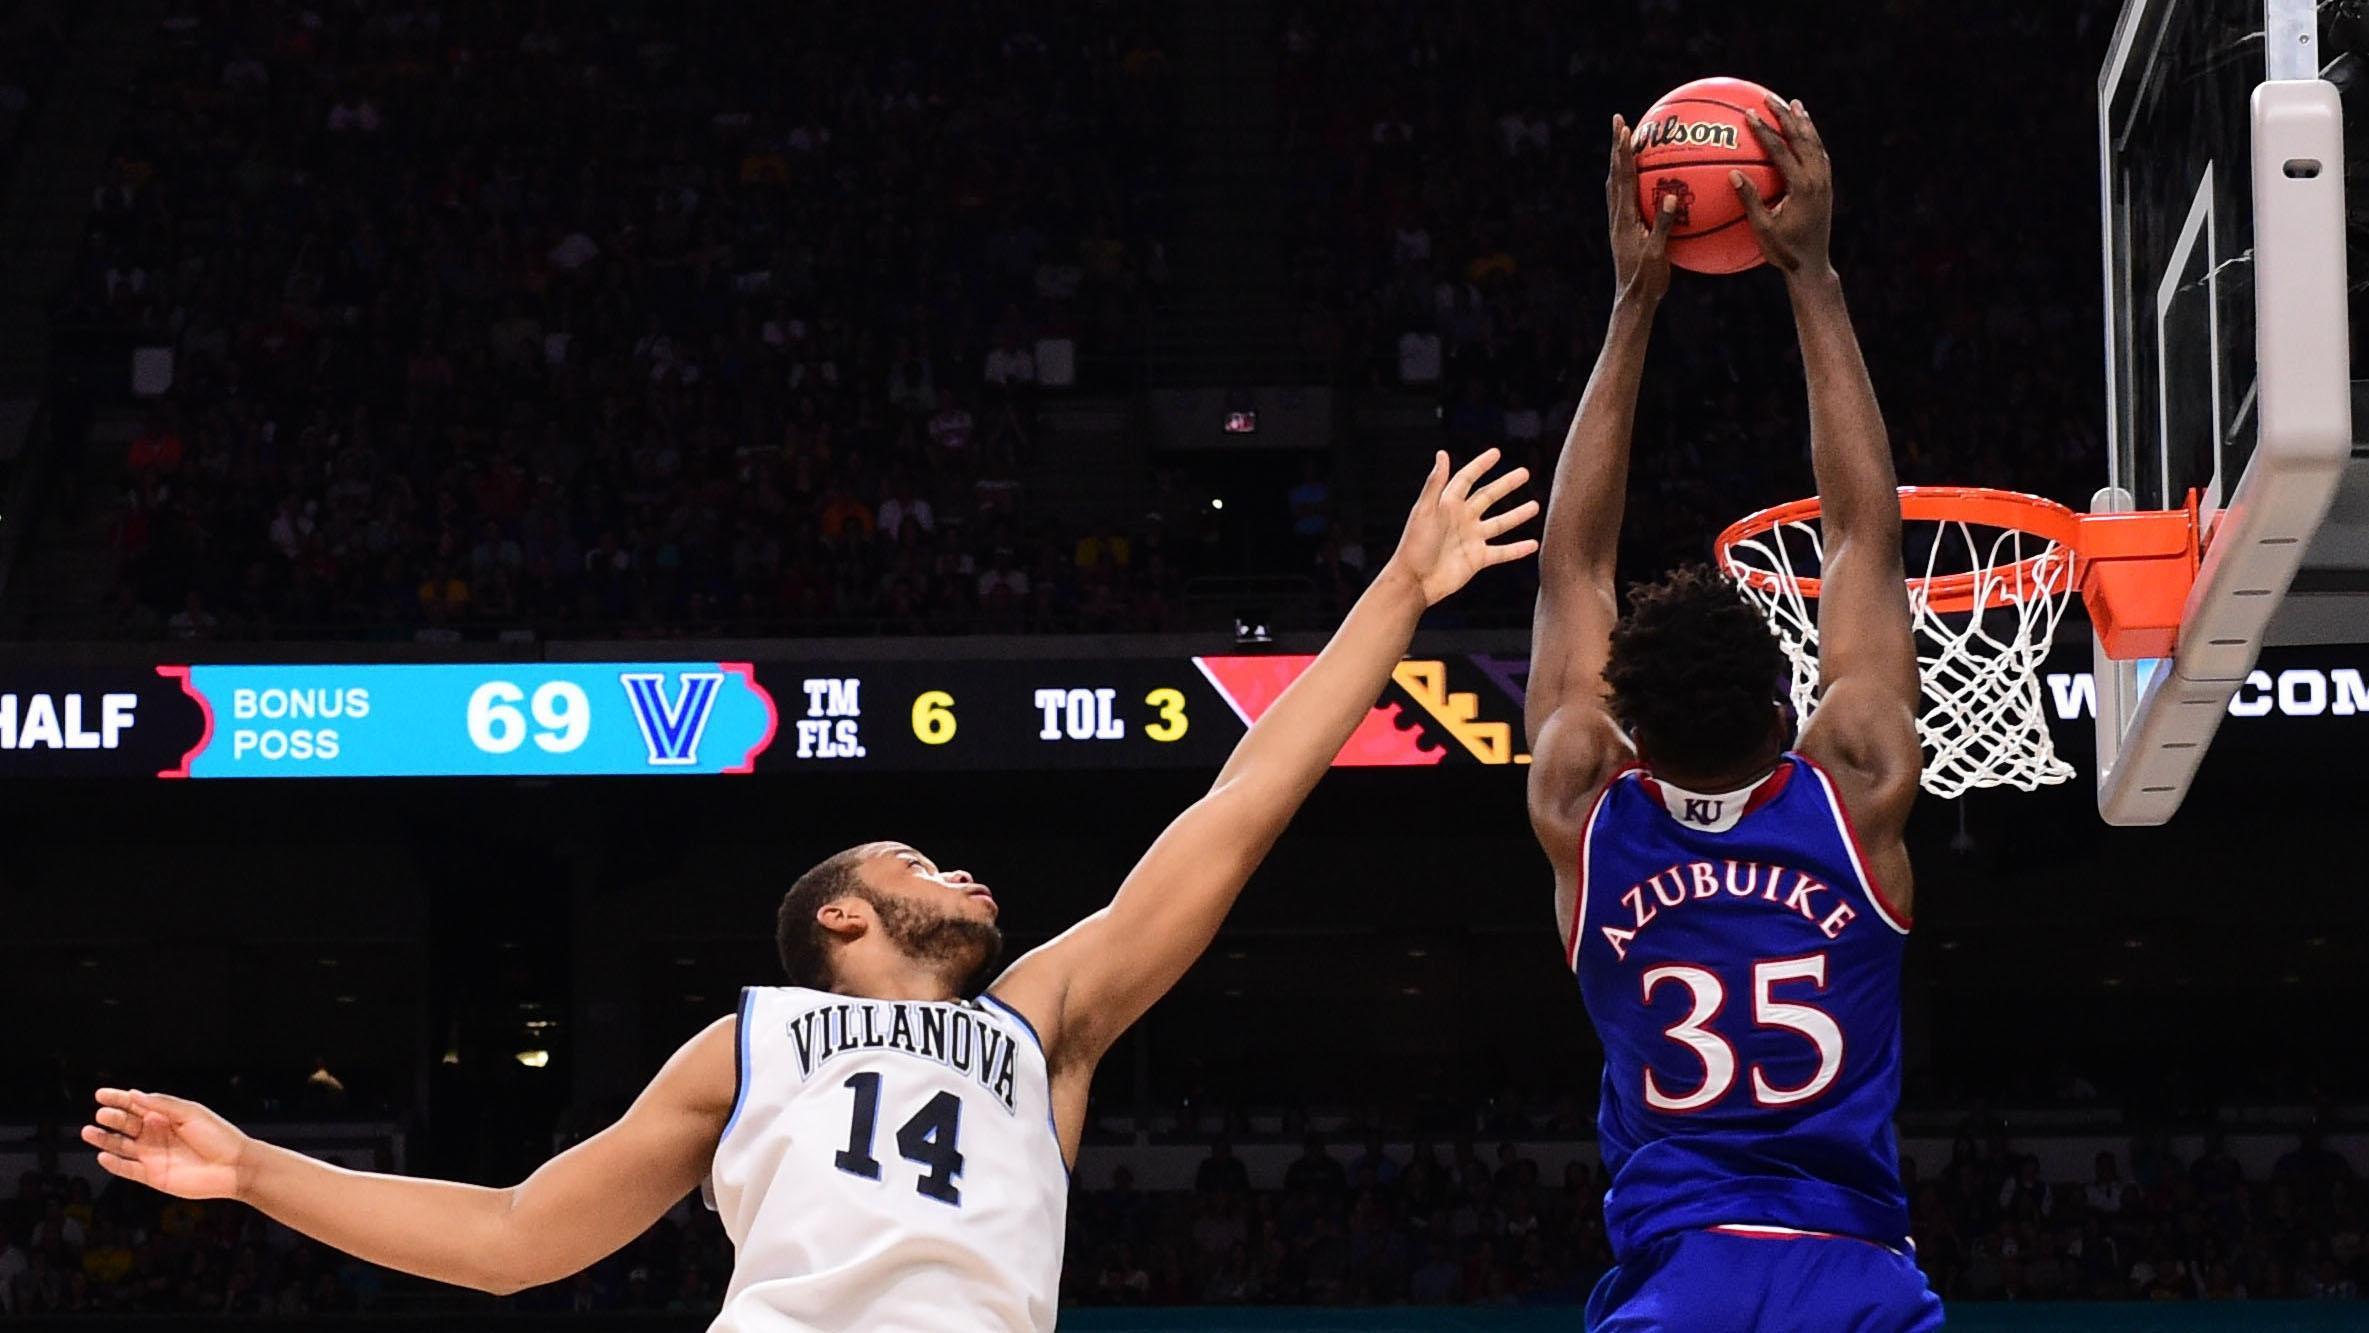 Kansas center Udoka Azubuike dunks against Michigan in the Final Four